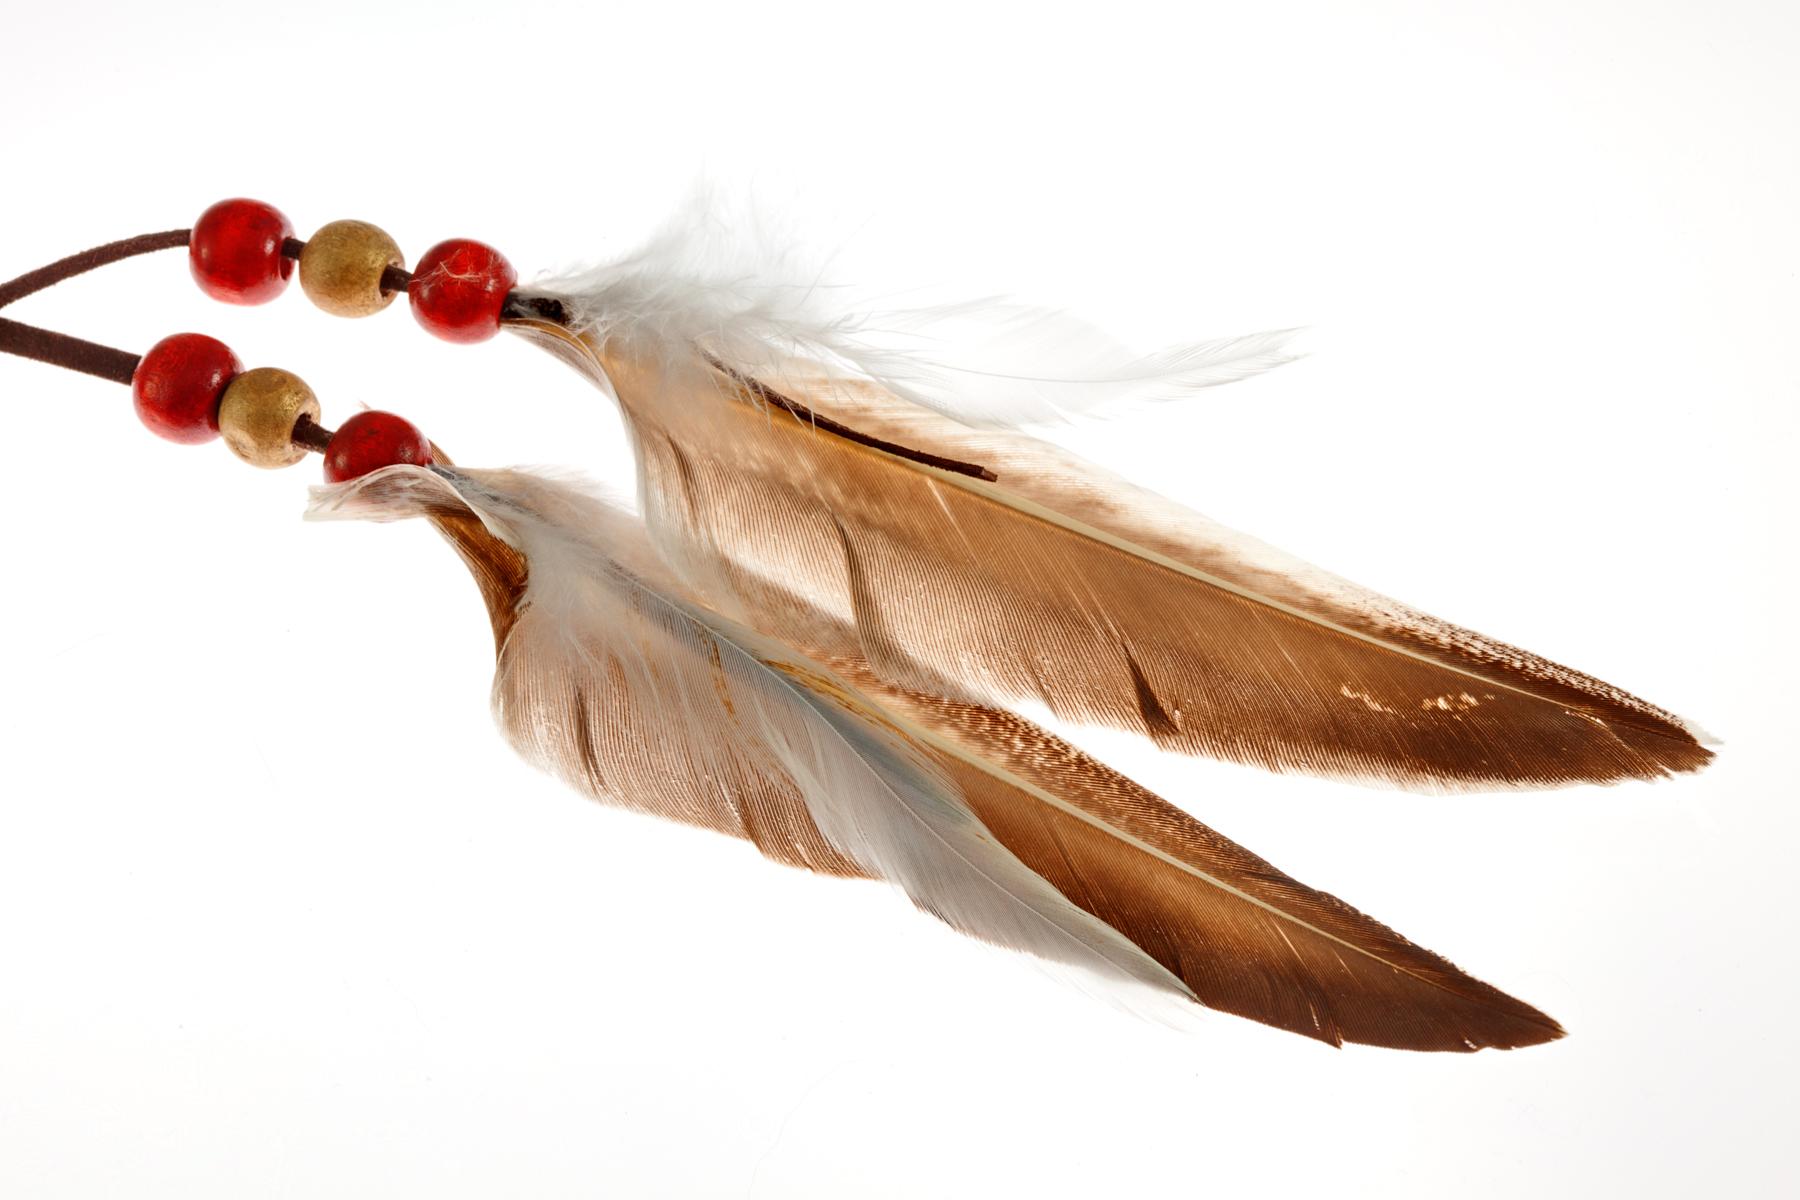 Dreamcatcher Feathers, Bead, Range, Native, Object, HQ Photo